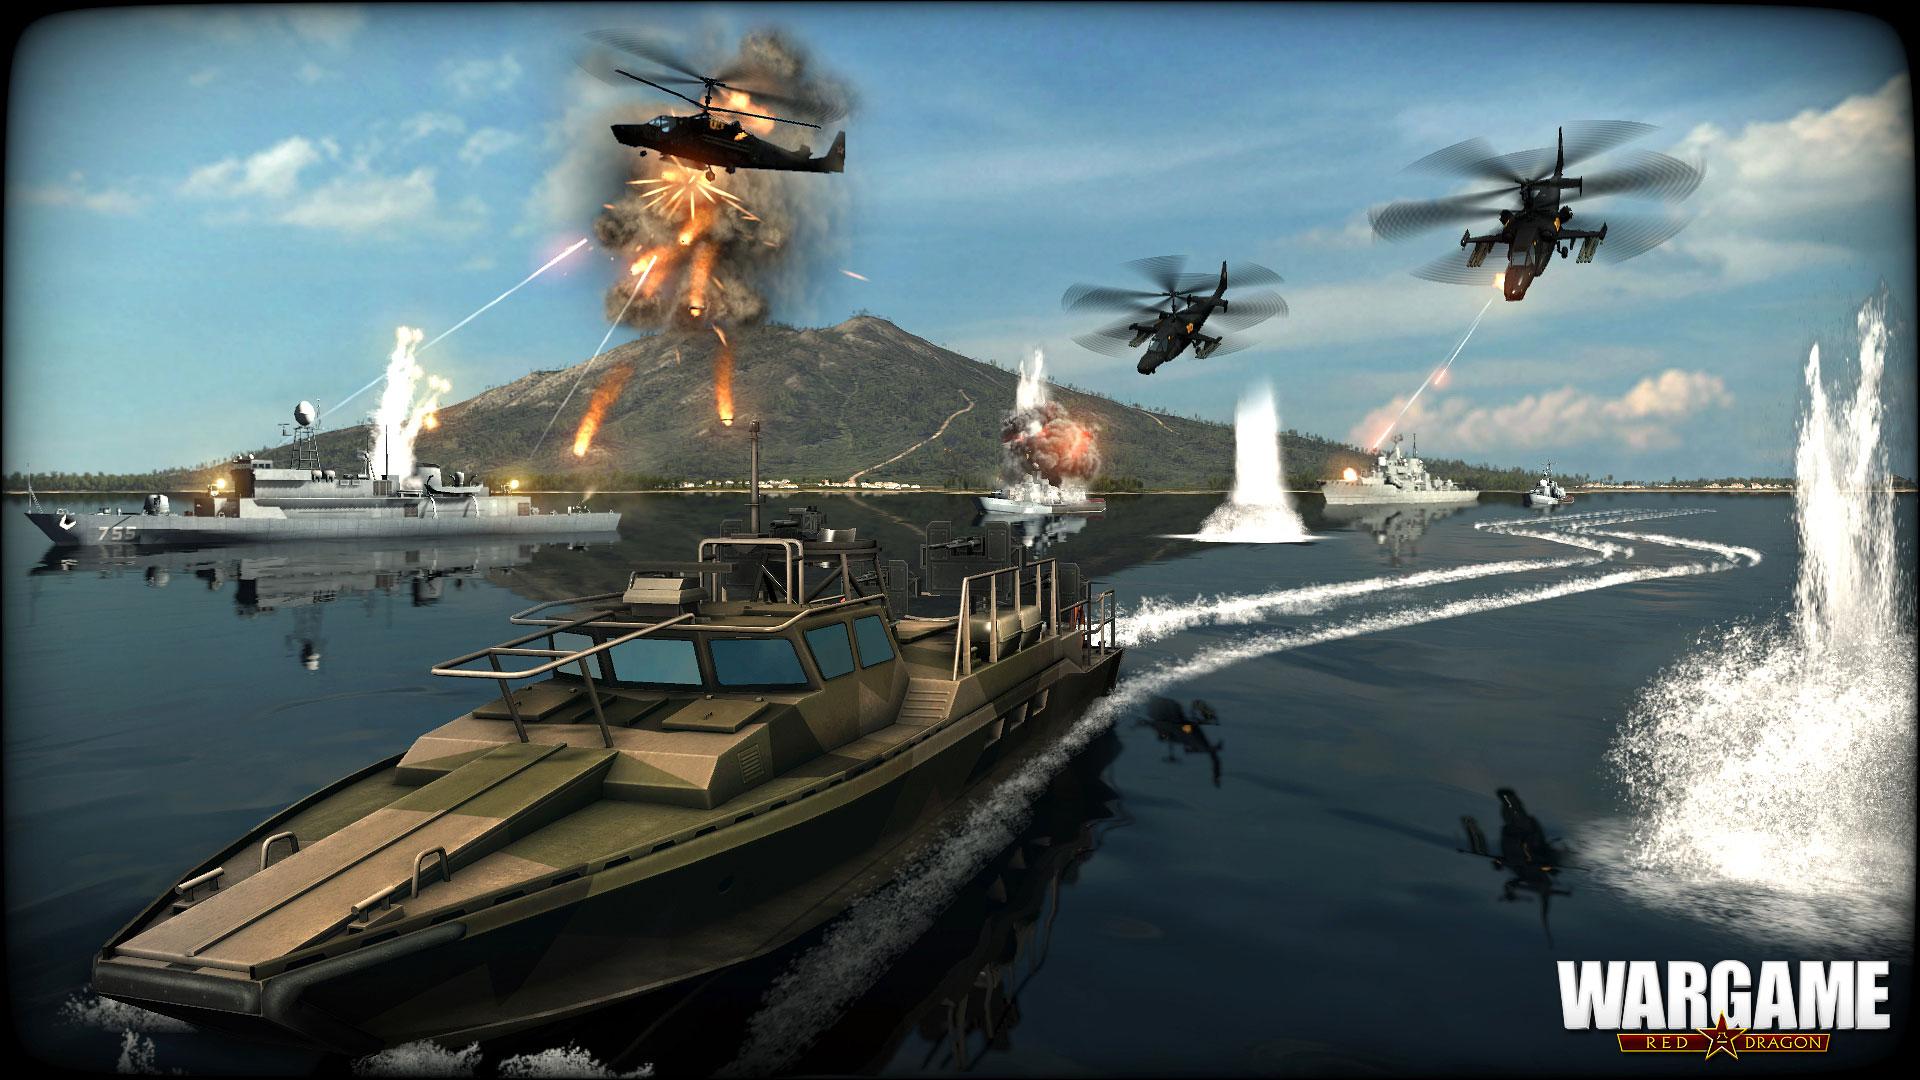 Wargame: Red Dragon ، بازی رایگان جدید فروشگاه اپیک گیمز